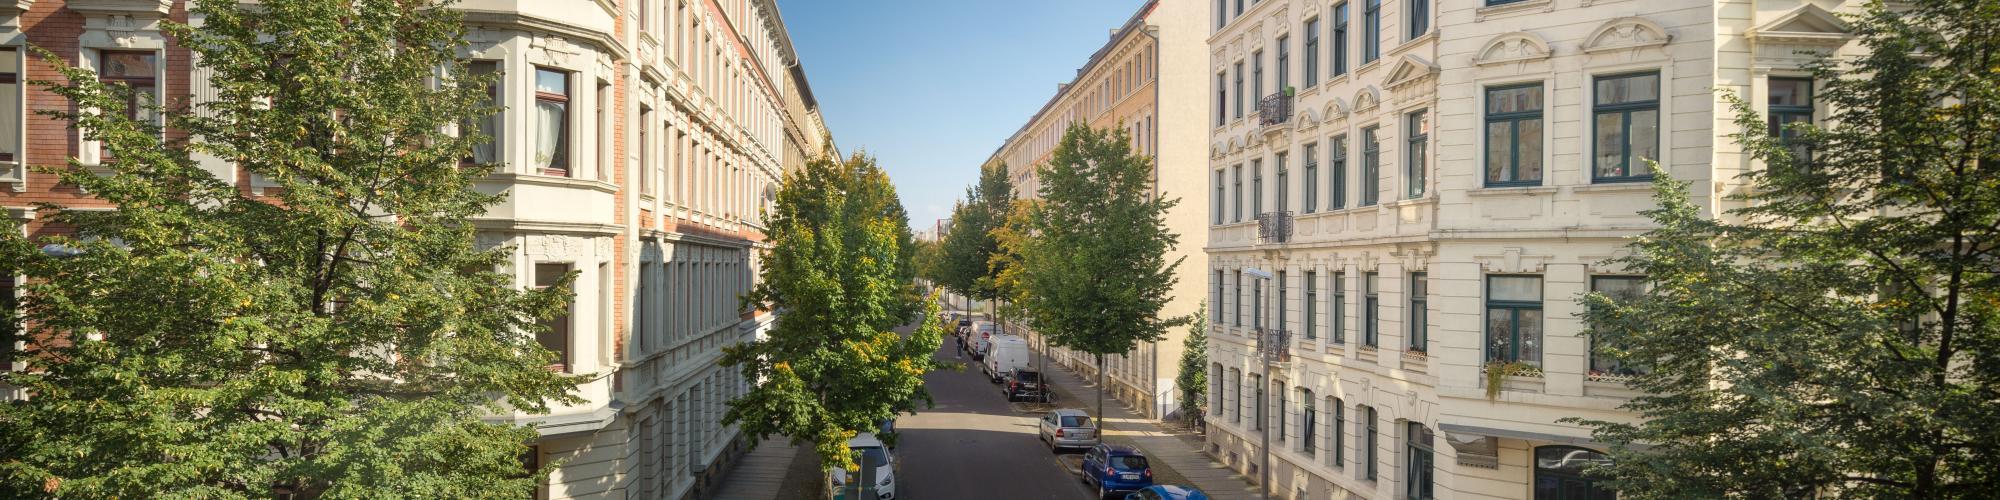 ZBI - Zentral Boden Immobiliengruppe